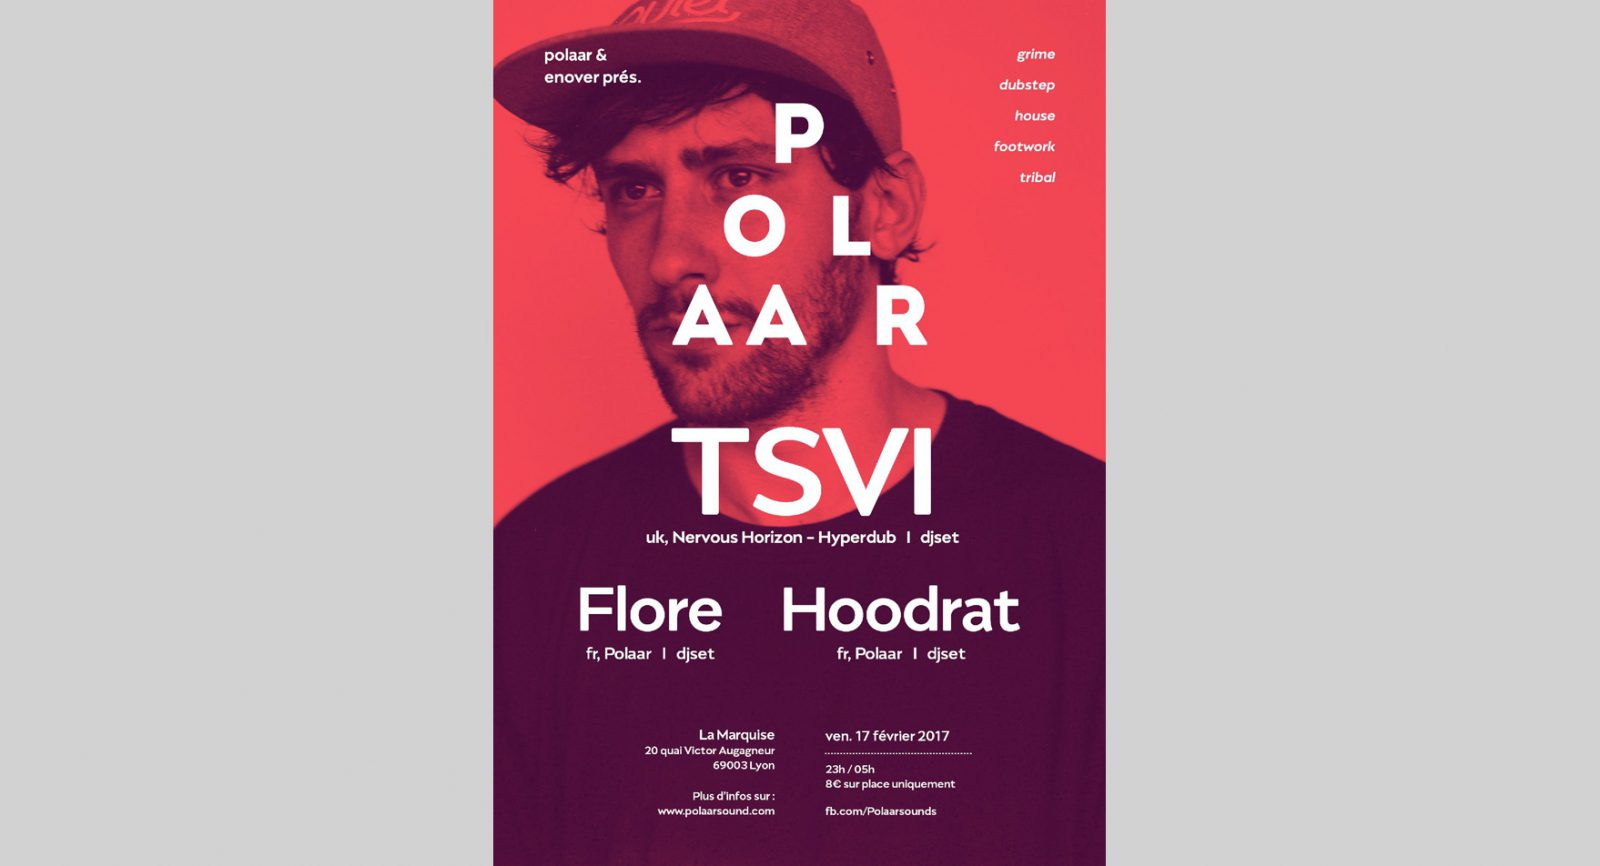 Polaar w/TSVI